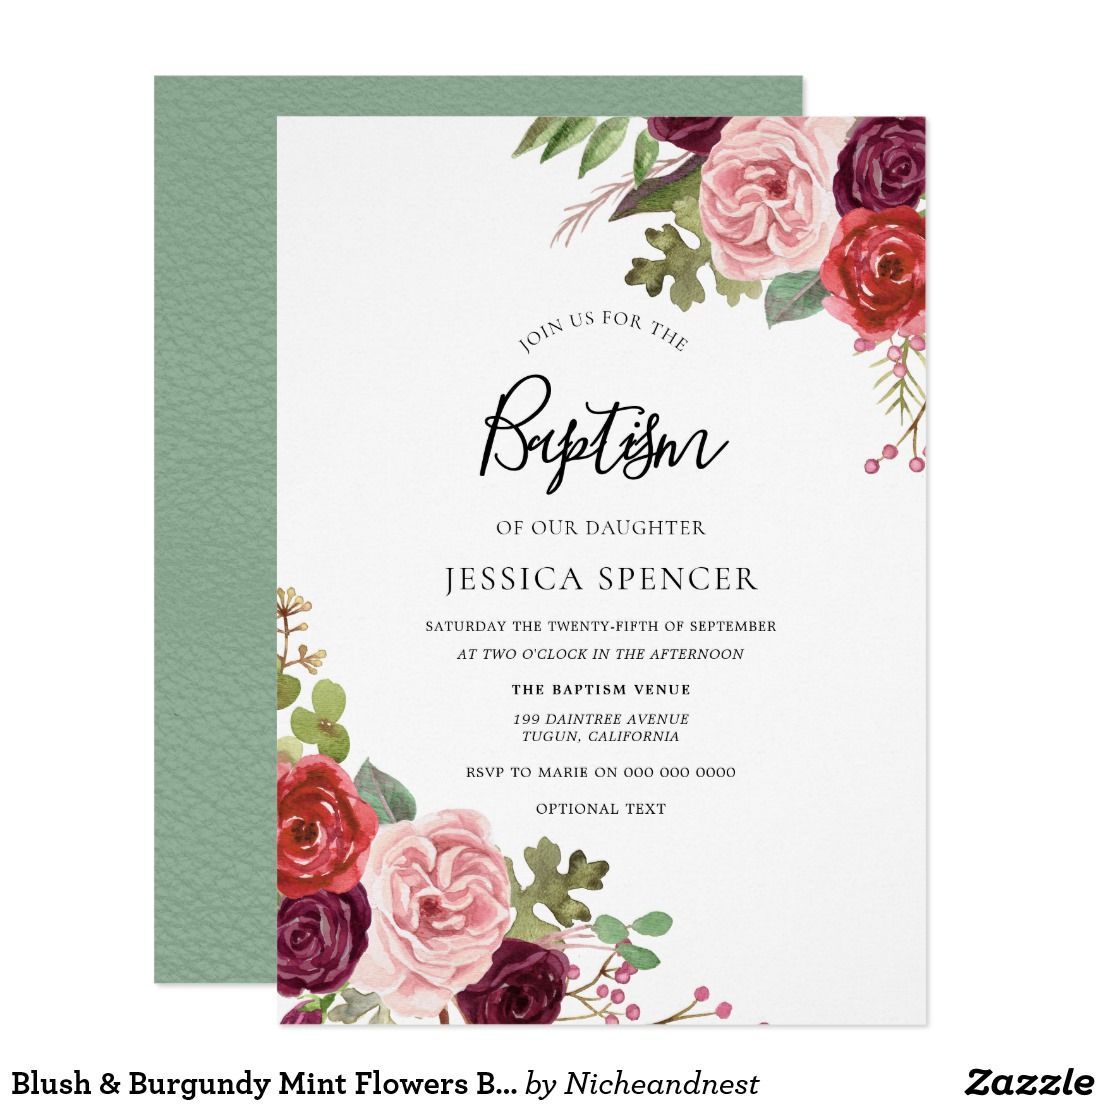 Blush & Burgundy Mint Flowers Baptism Invitation Zazzle